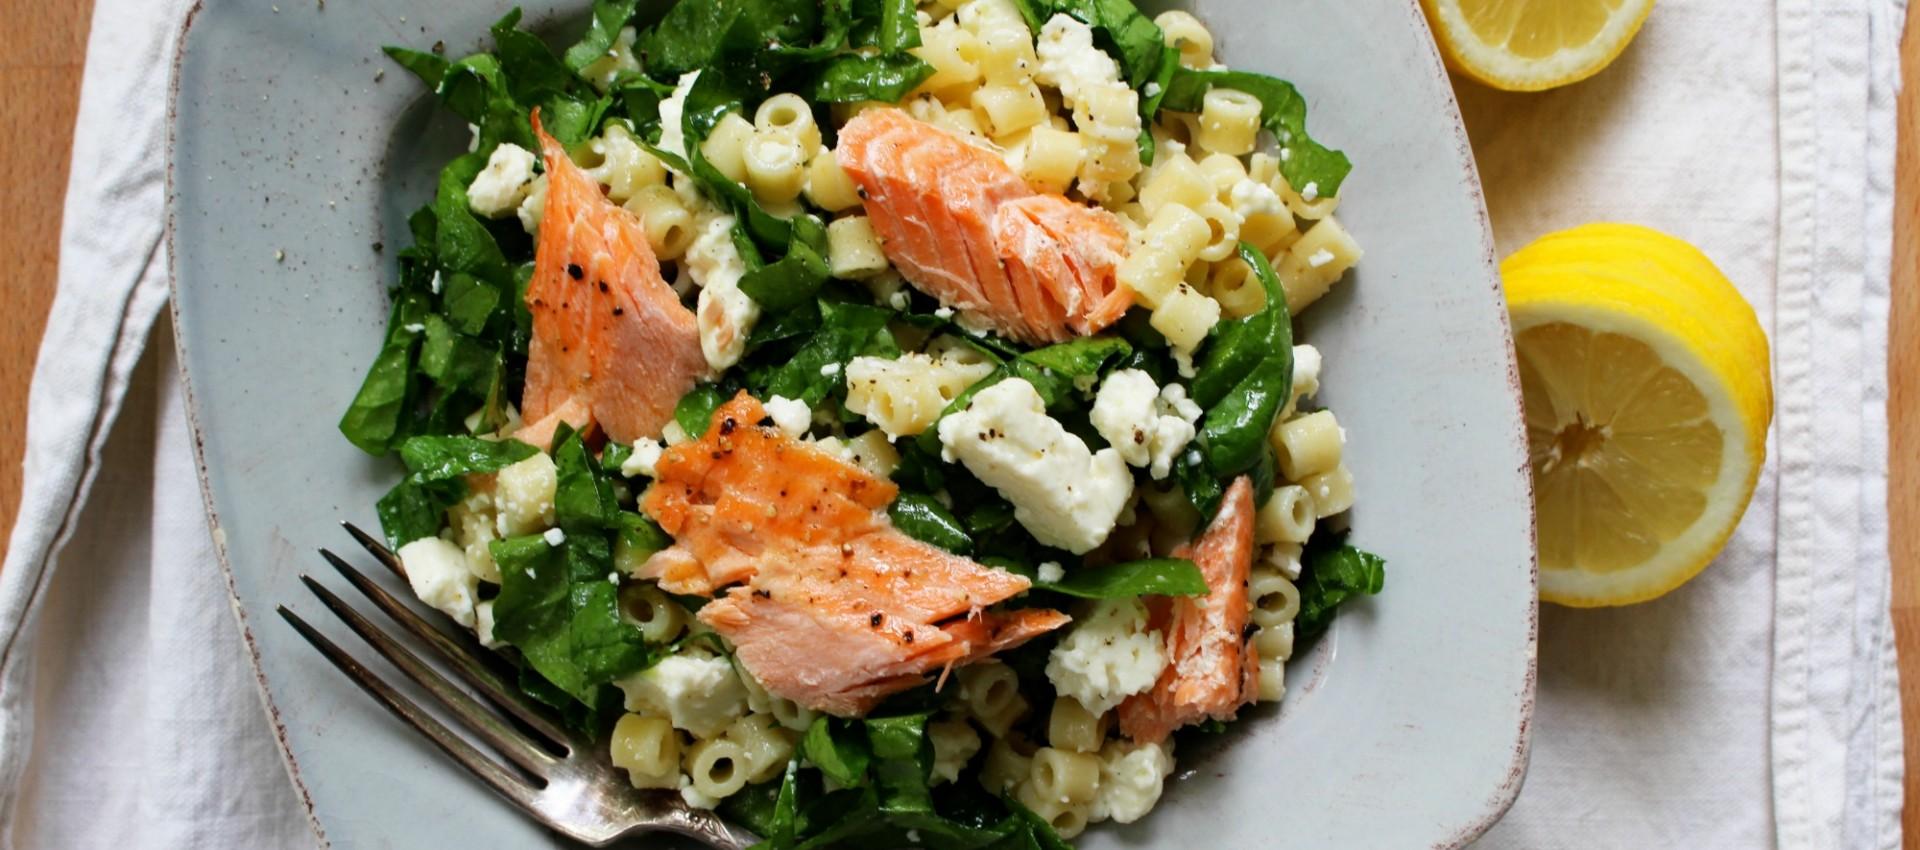 Spinach & feta pasta salad 1